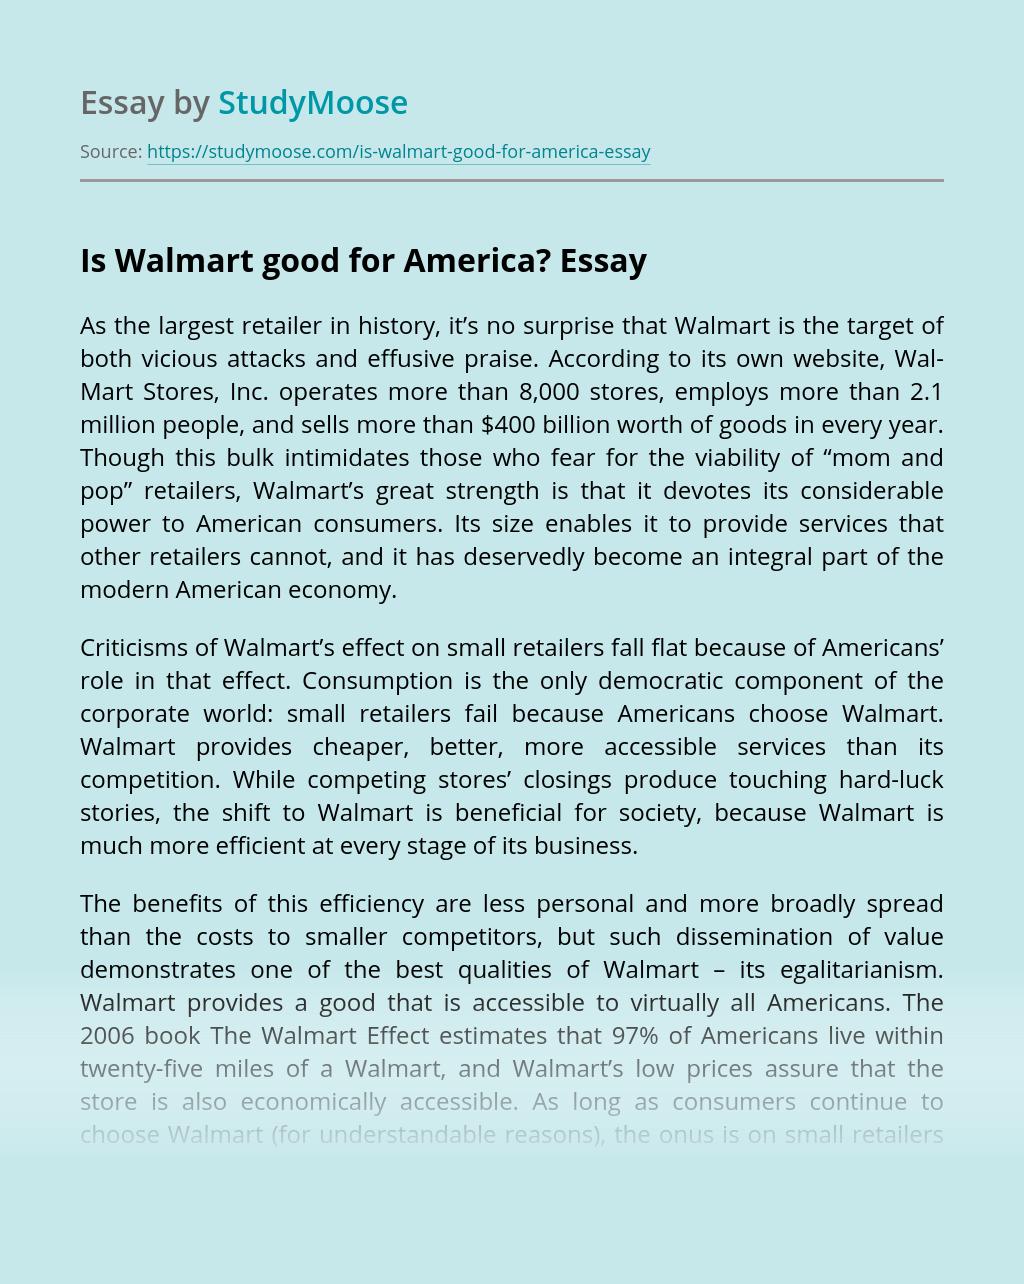 Is Walmart good for America?